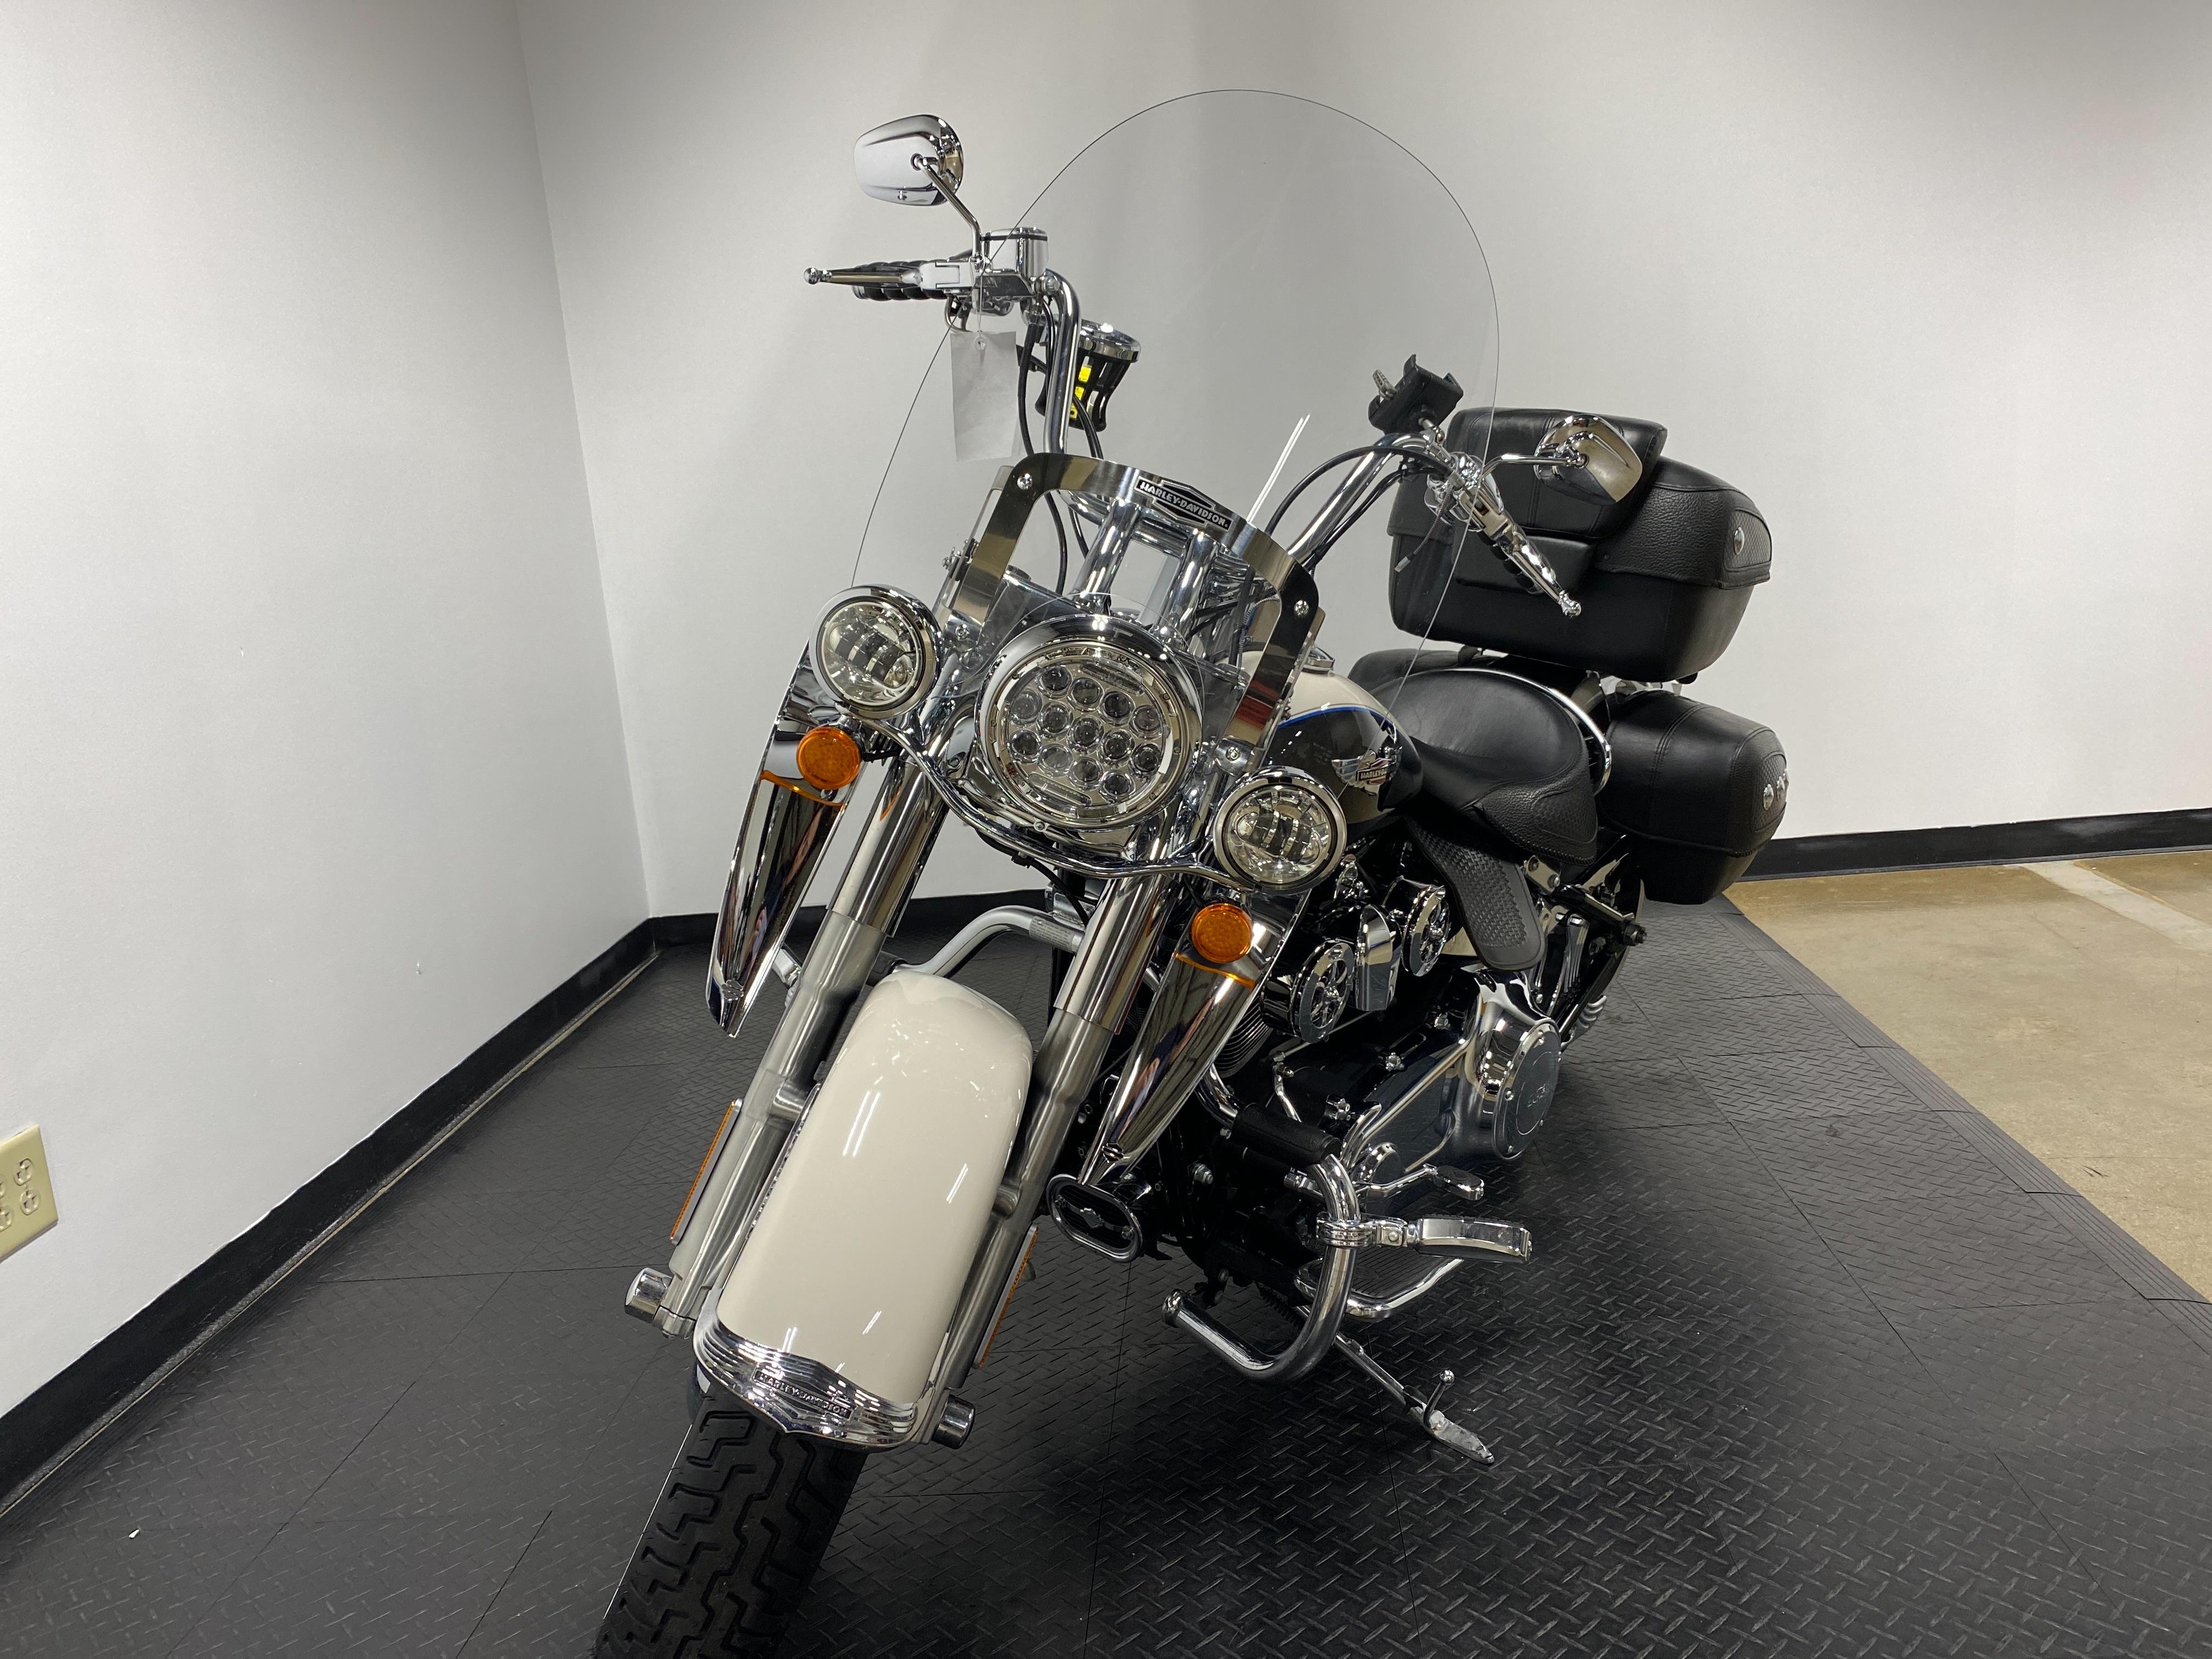 2013 Harley-Davidson FLSTN103 at Cannonball Harley-Davidson